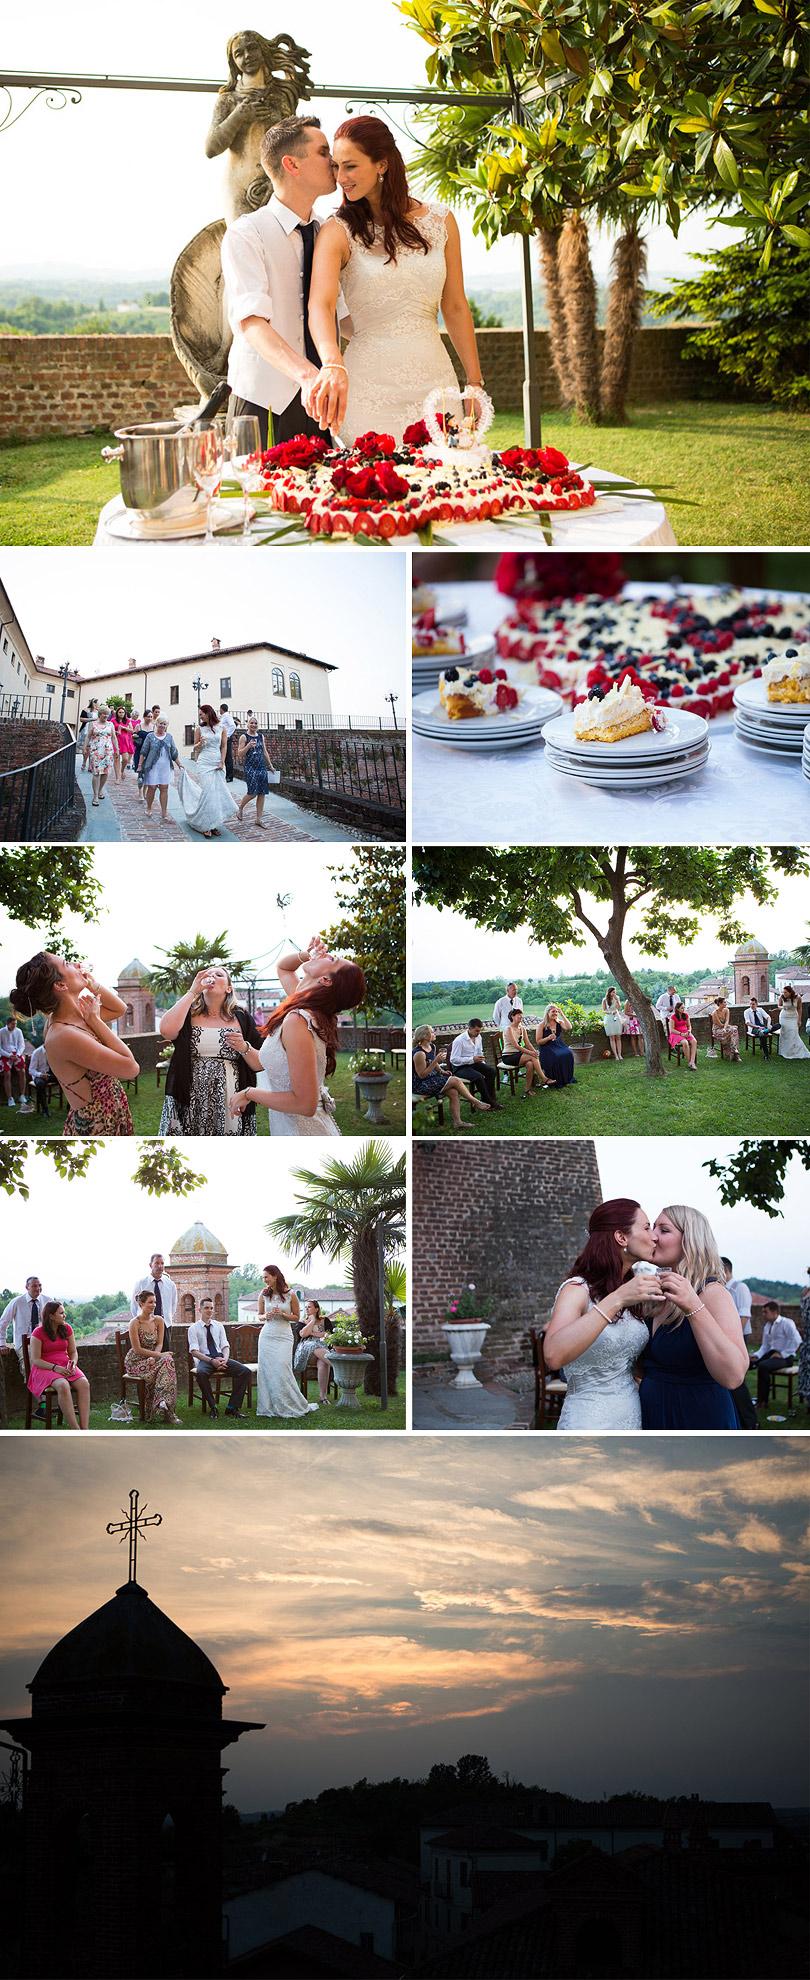 Castello-di-Cortanze-Italian-Wedding-LilyandFrankPhotography_32.jpg